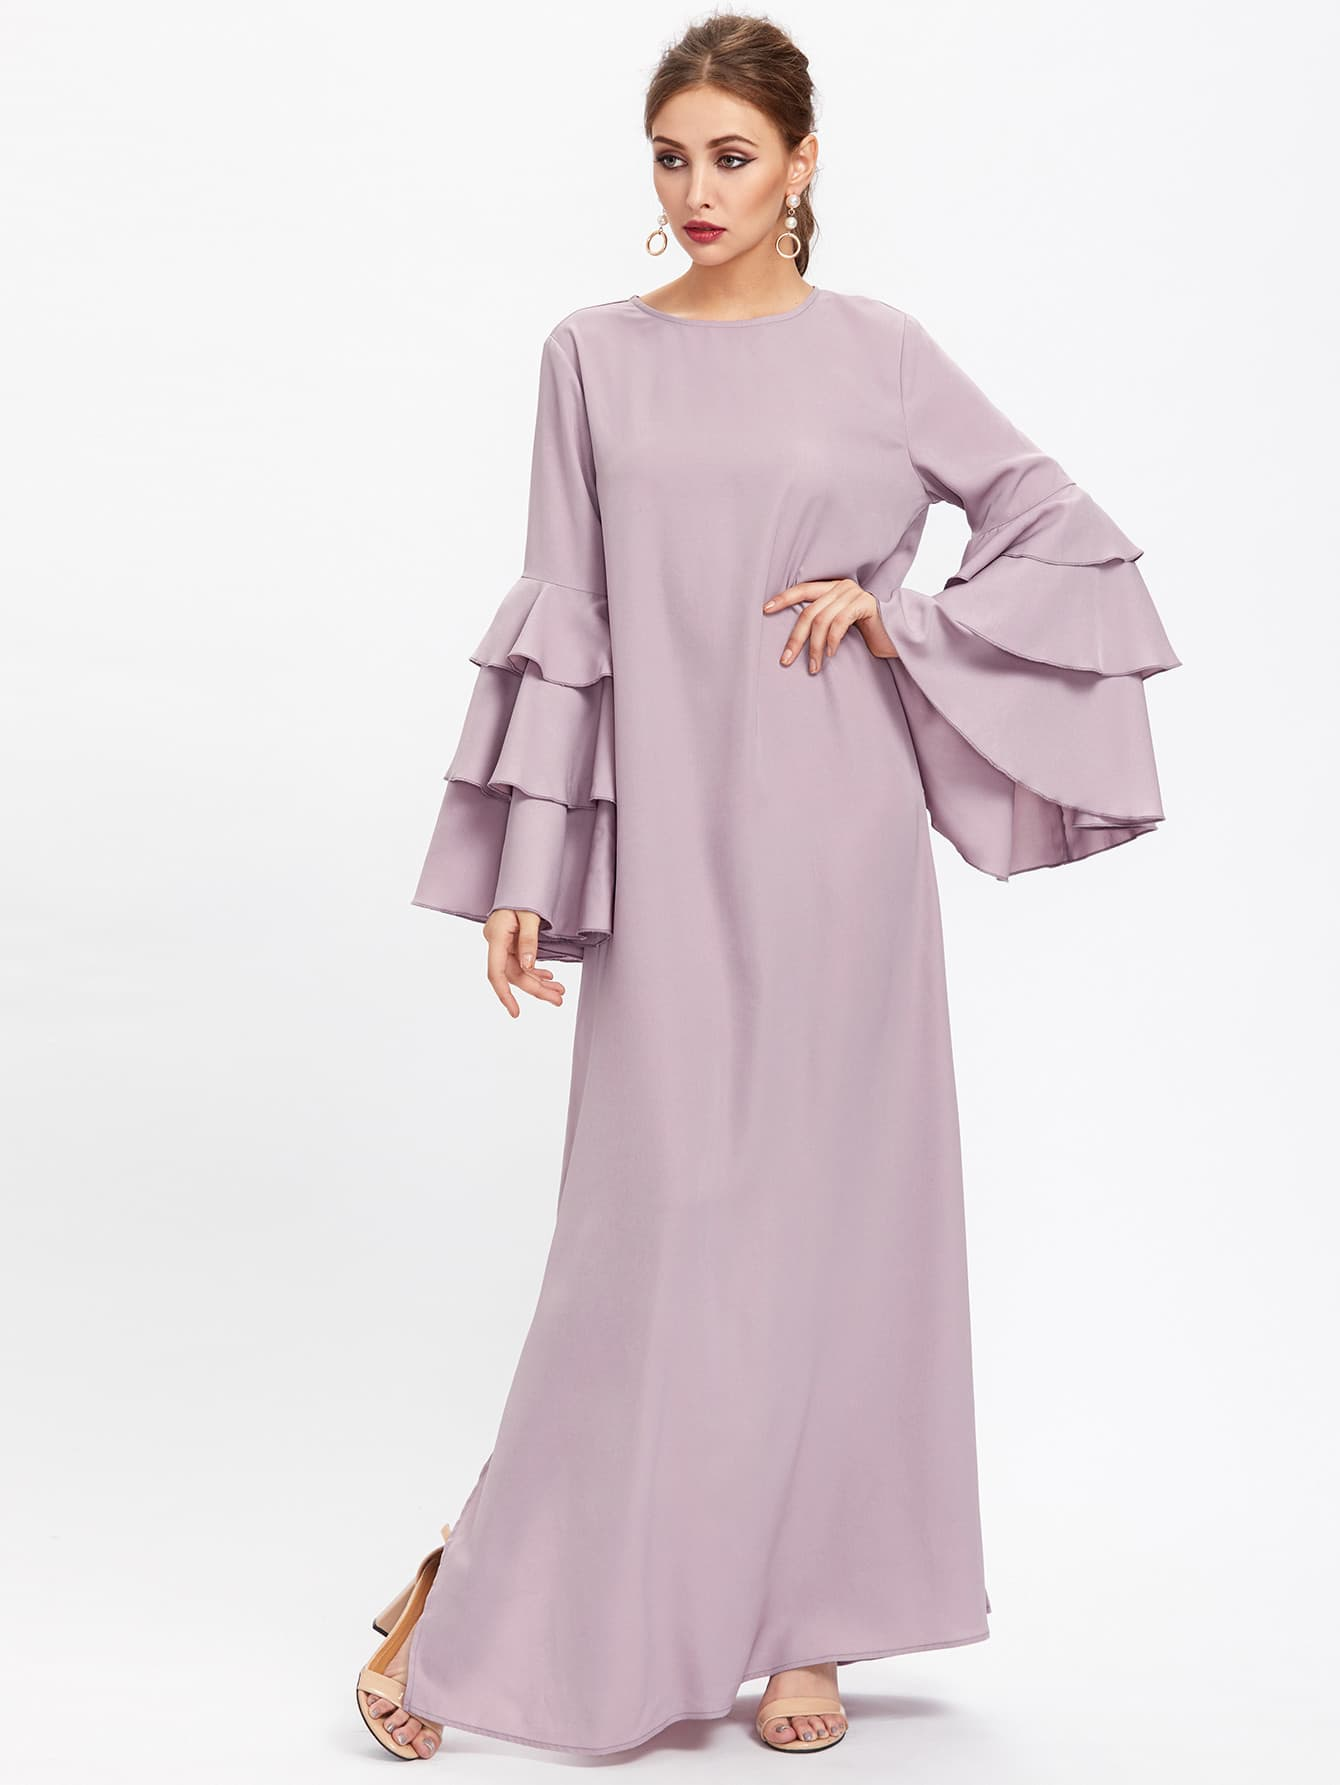 Exaggerate Layered Bell Sleeve Slit Hijab Evening Dress